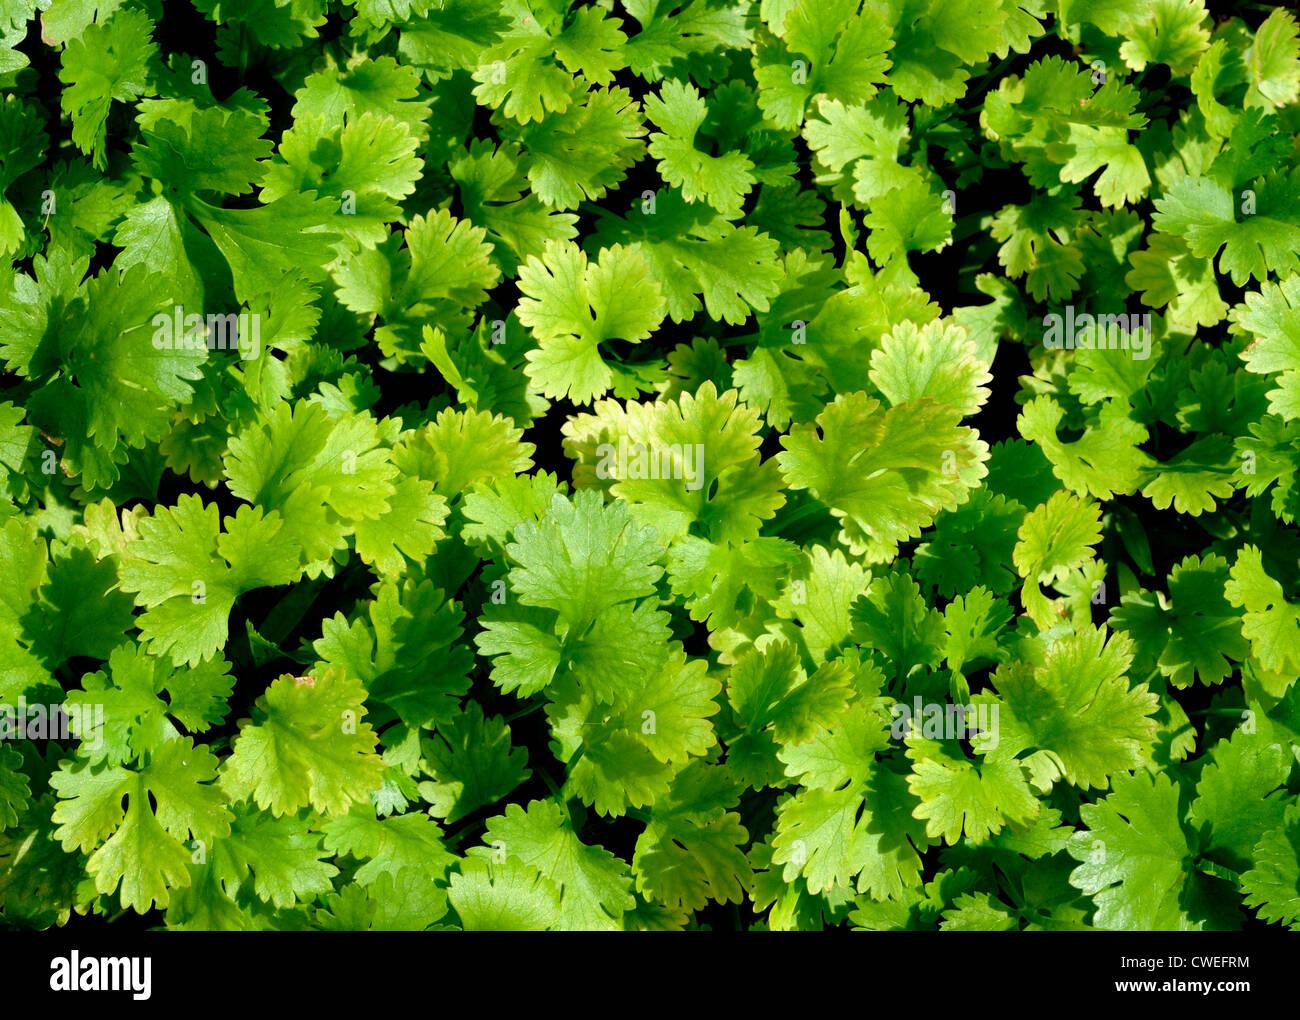 junge frische koriander kraut pflanze stockfoto bild 50106888 alamy. Black Bedroom Furniture Sets. Home Design Ideas